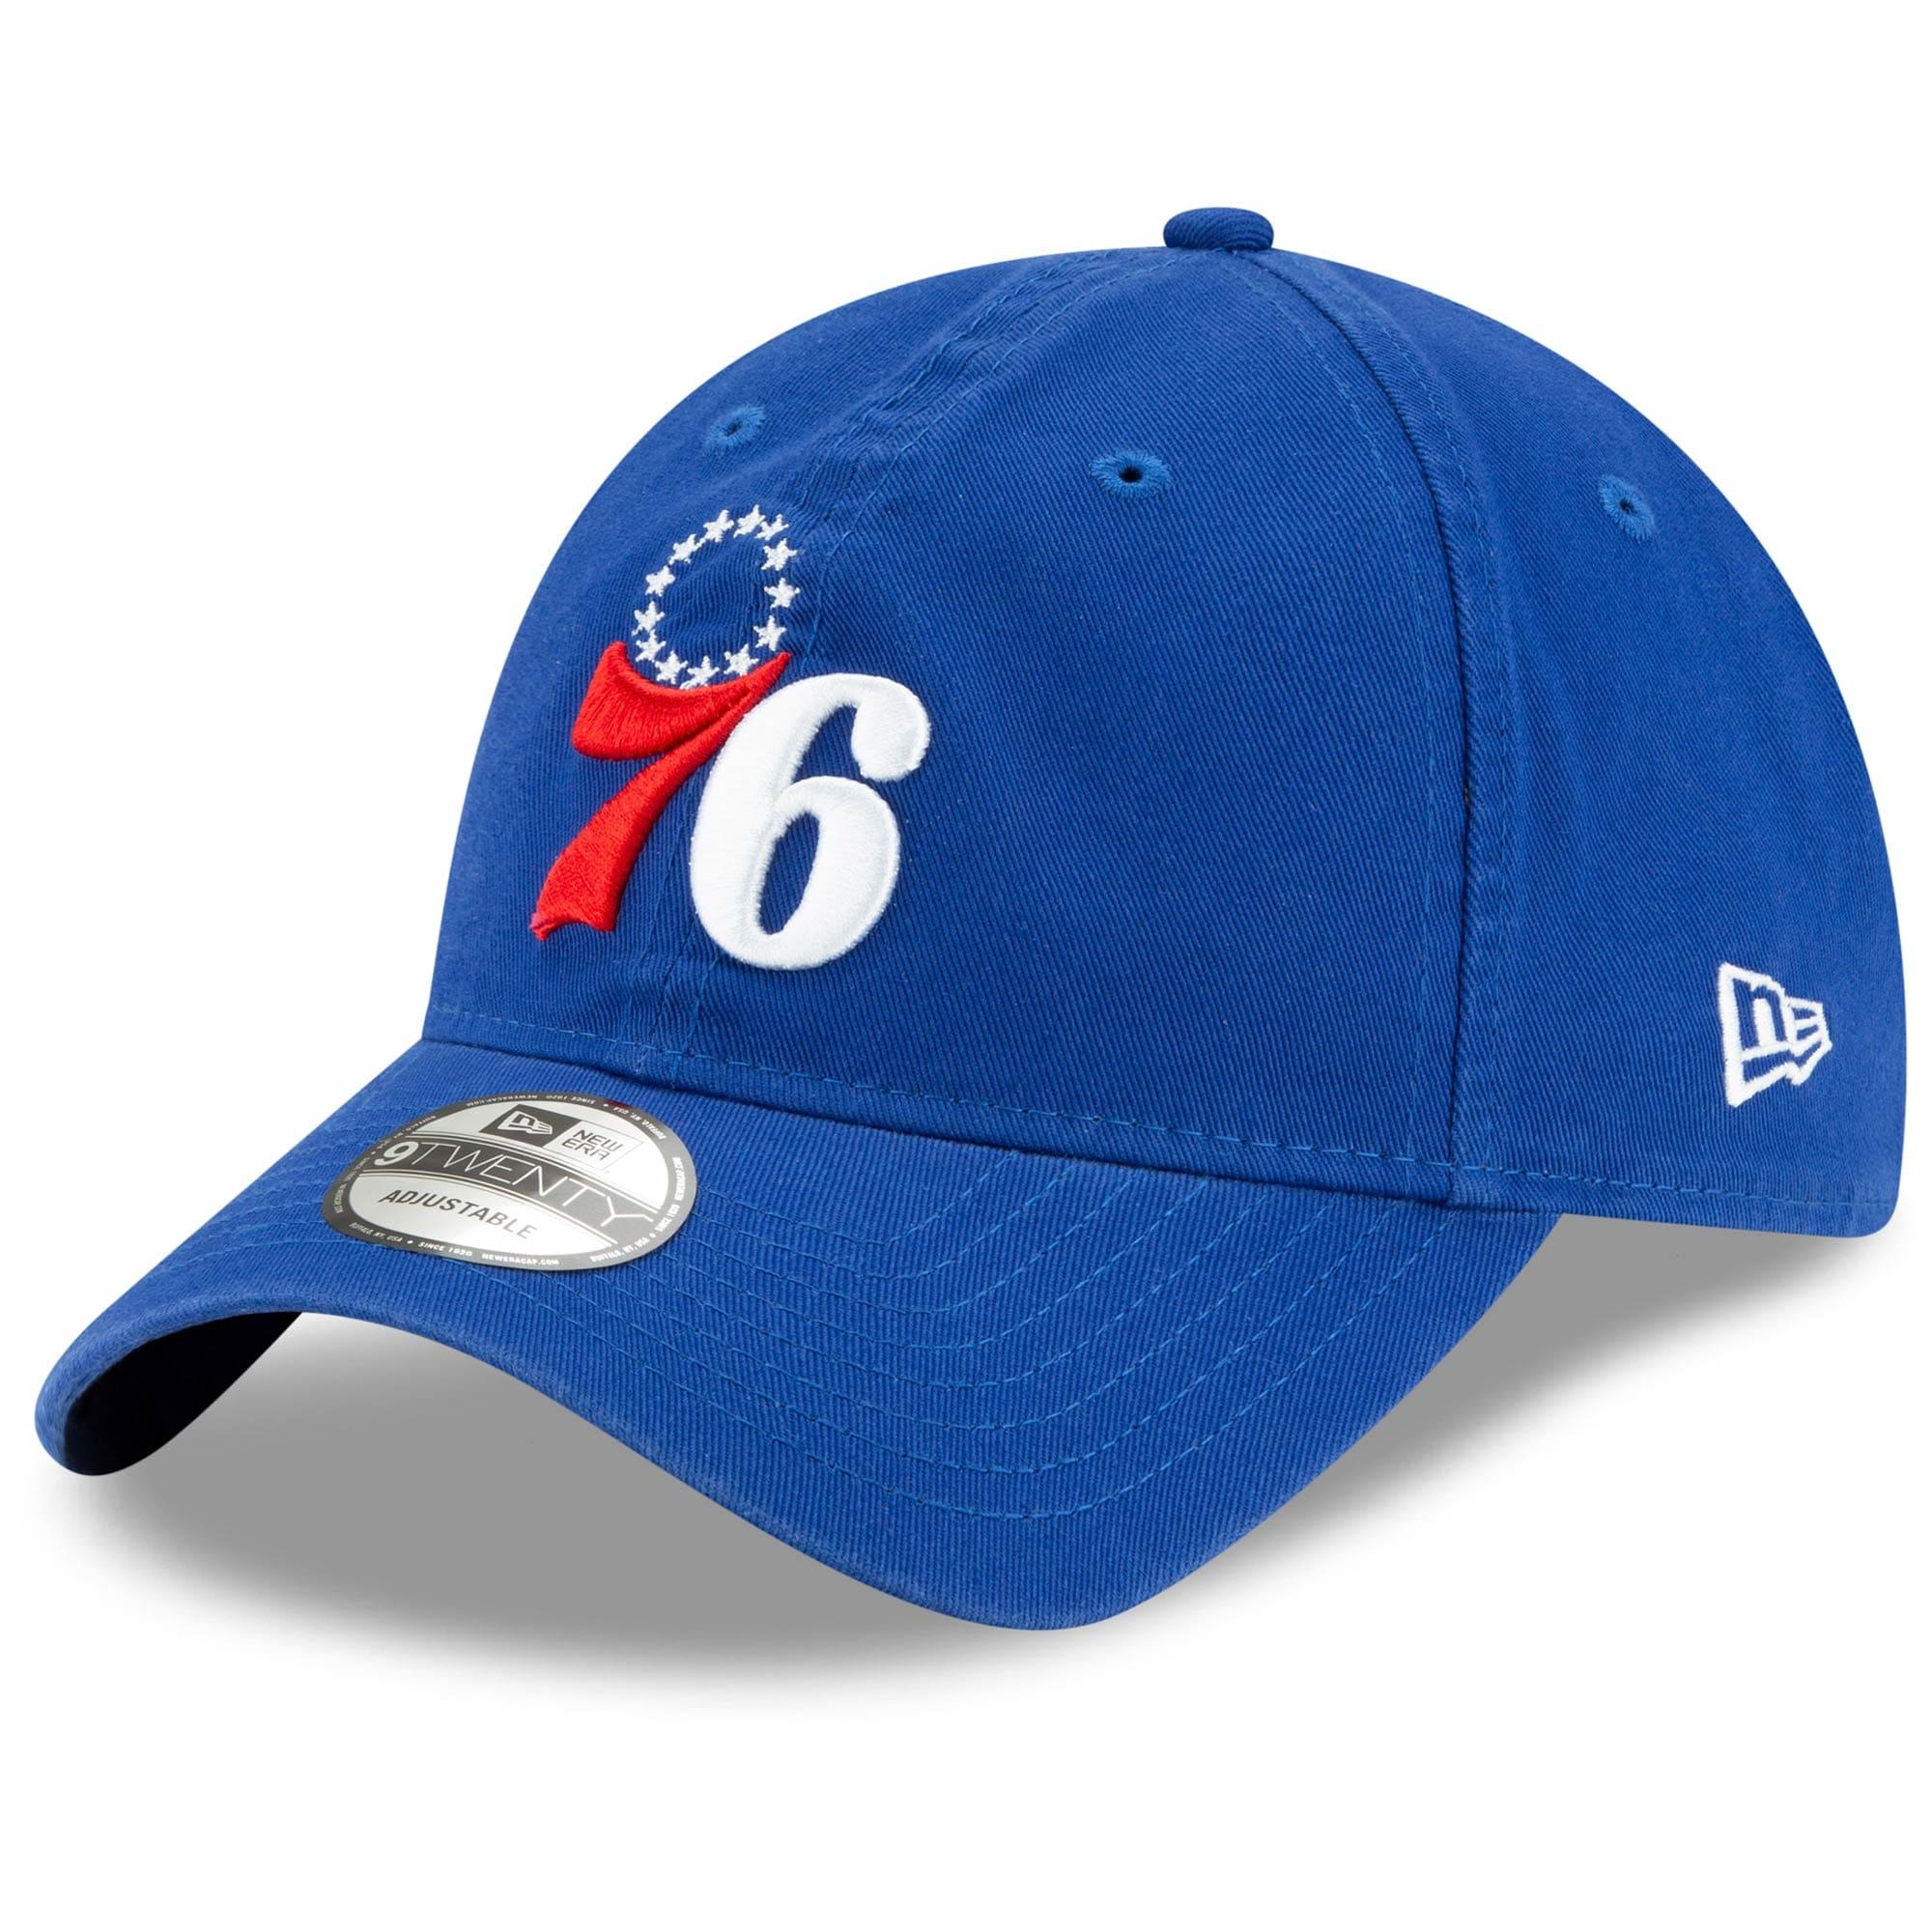 Philadelphia 76ers New Era Team Localized 9TWENTY Adjustable Hat - Royal